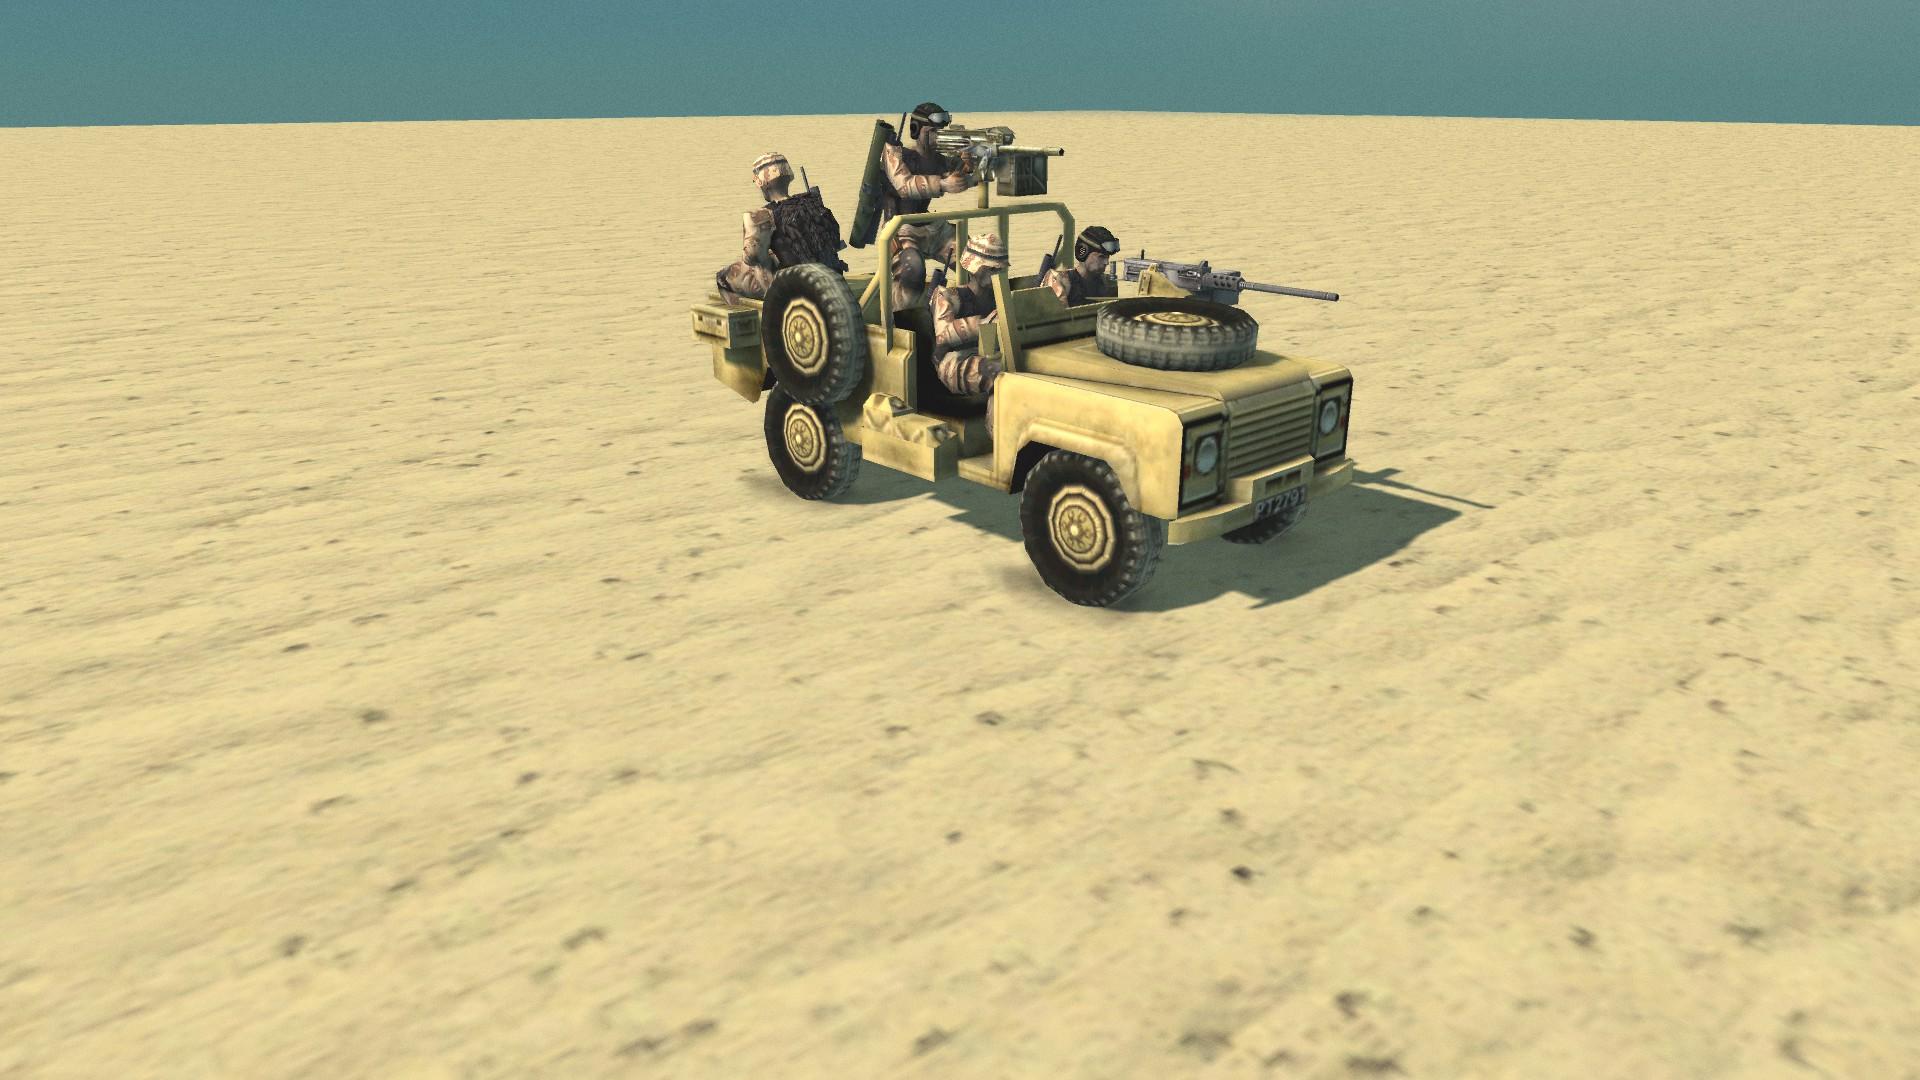 Landrover image - Conflict: Desert Storm II Remastered mod